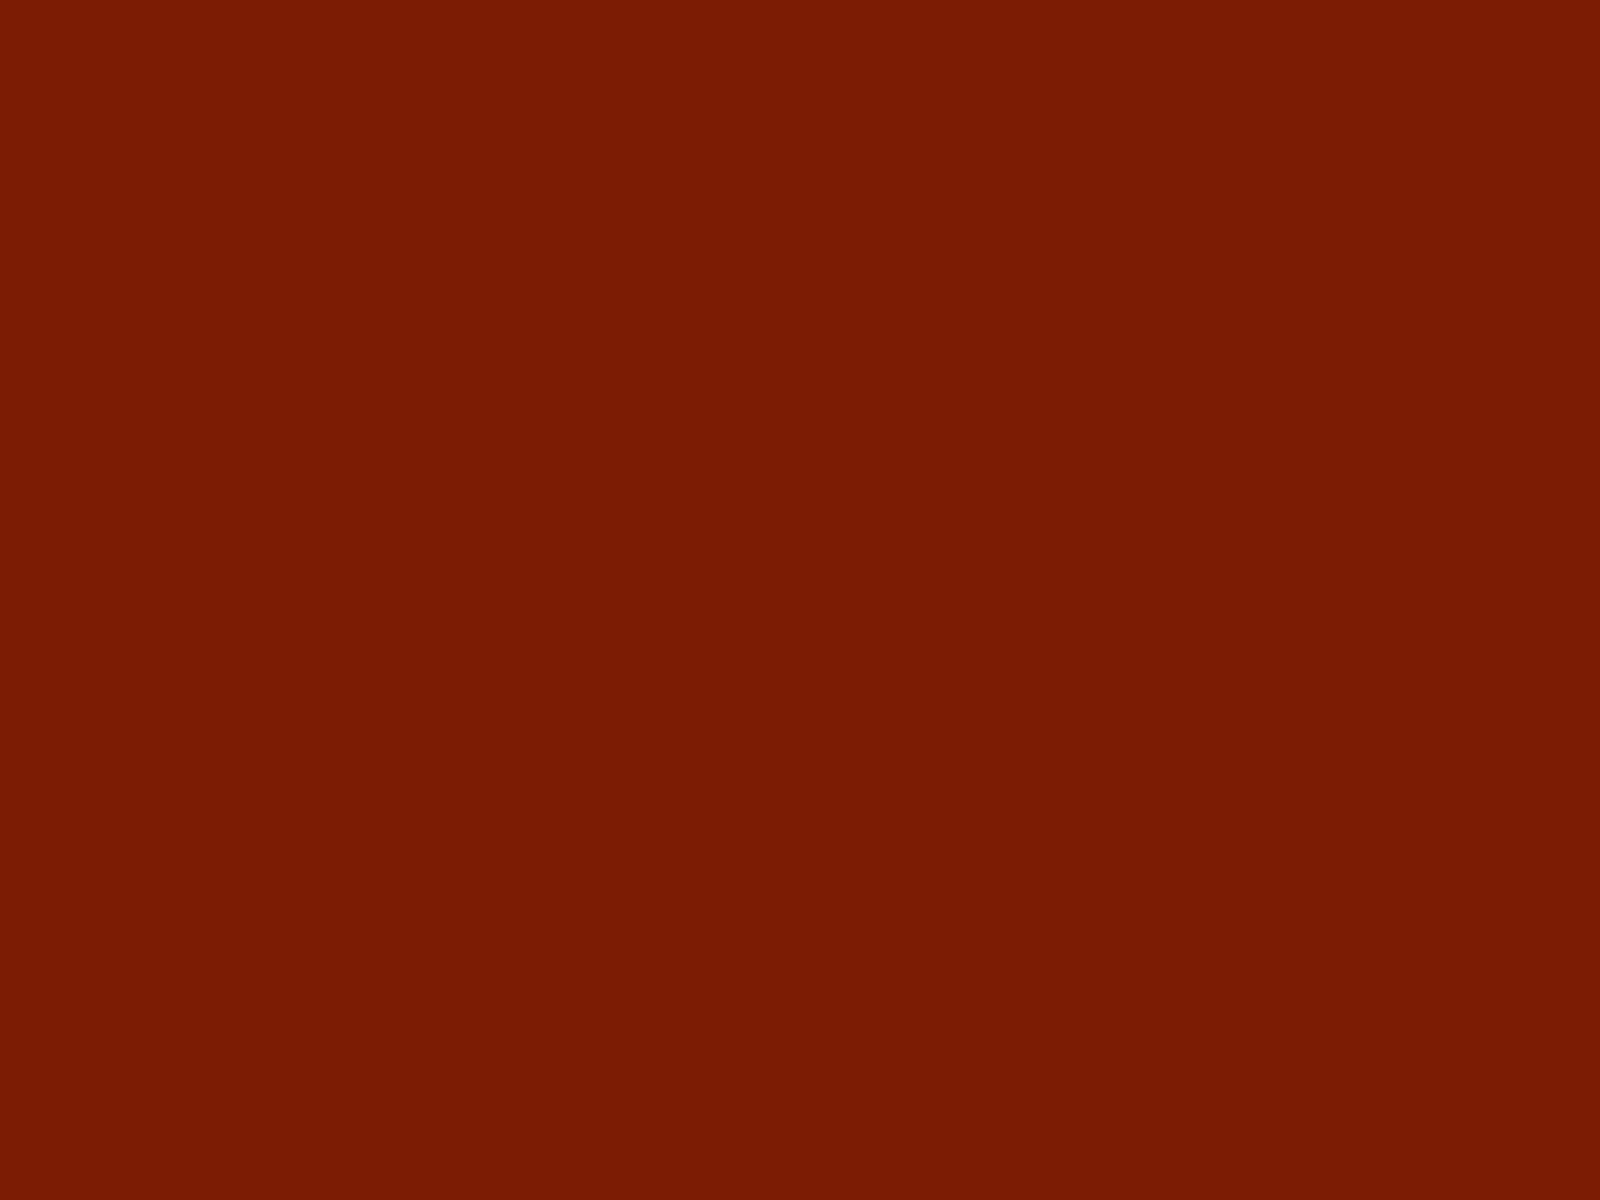 1600x1200 Kenyan Copper Solid Color Background